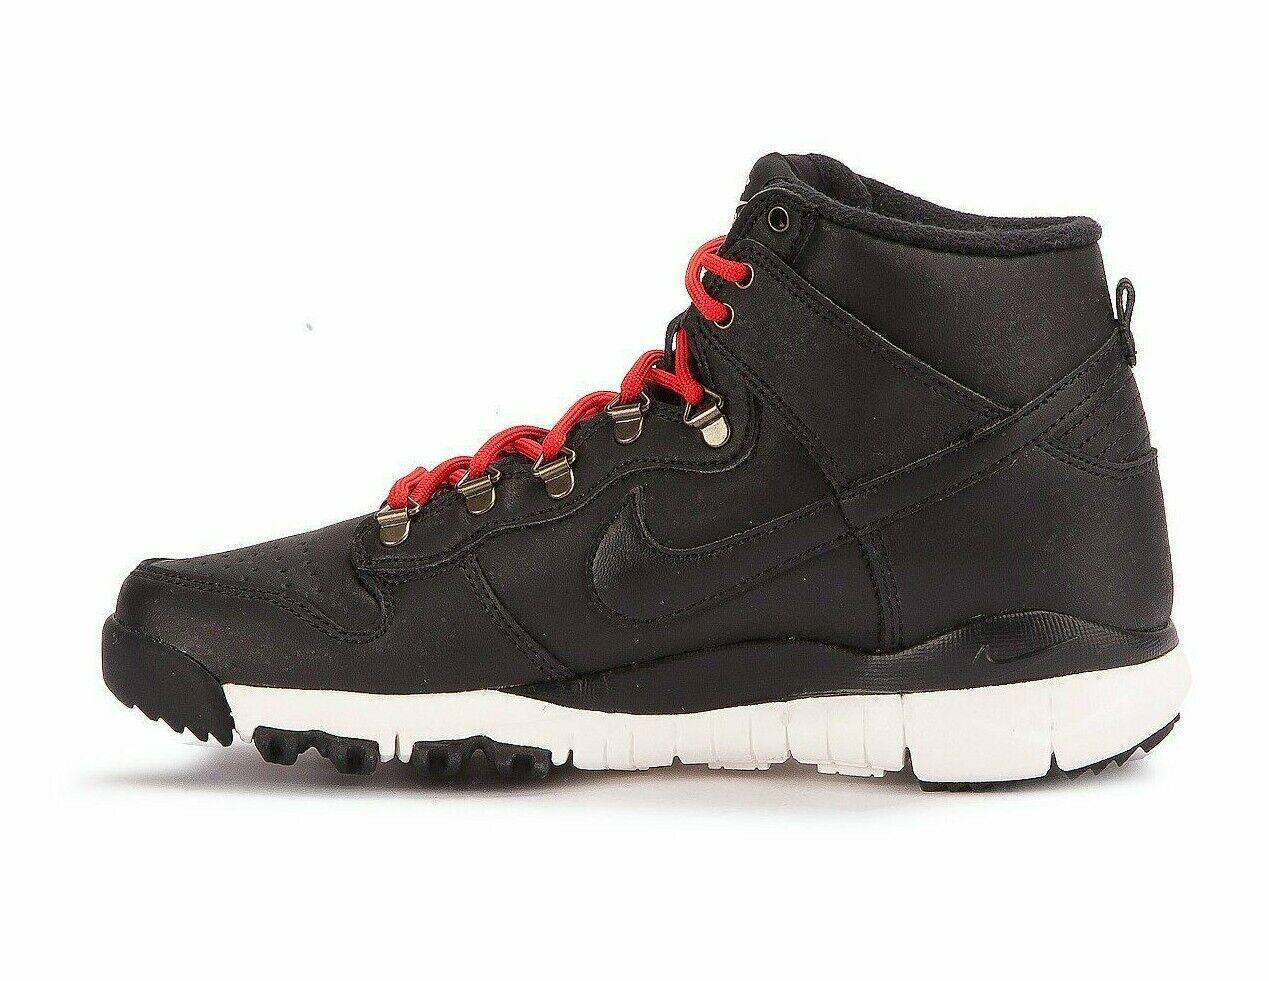 newest 40fb7 48ce1 Nike SB DUNK HIGH BOOT Black Sail Ale Brown 806335-012 (629) Men's Shoes